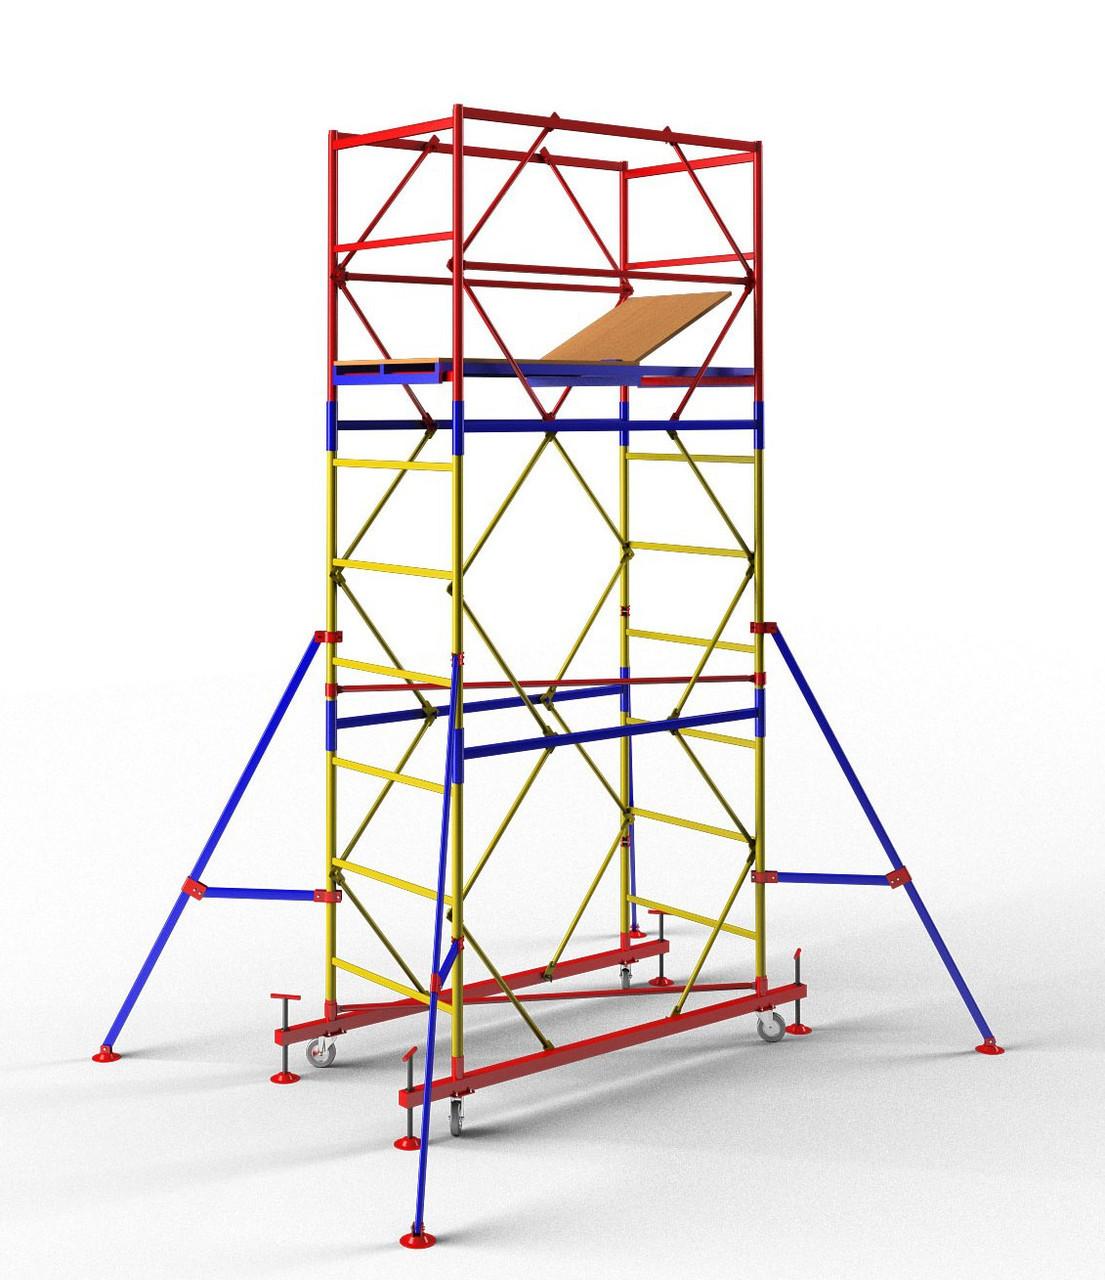 Вышка-тура мобильная облегченная 1,2 х 2,0 м (3+1) Раб.высота 6,2 м